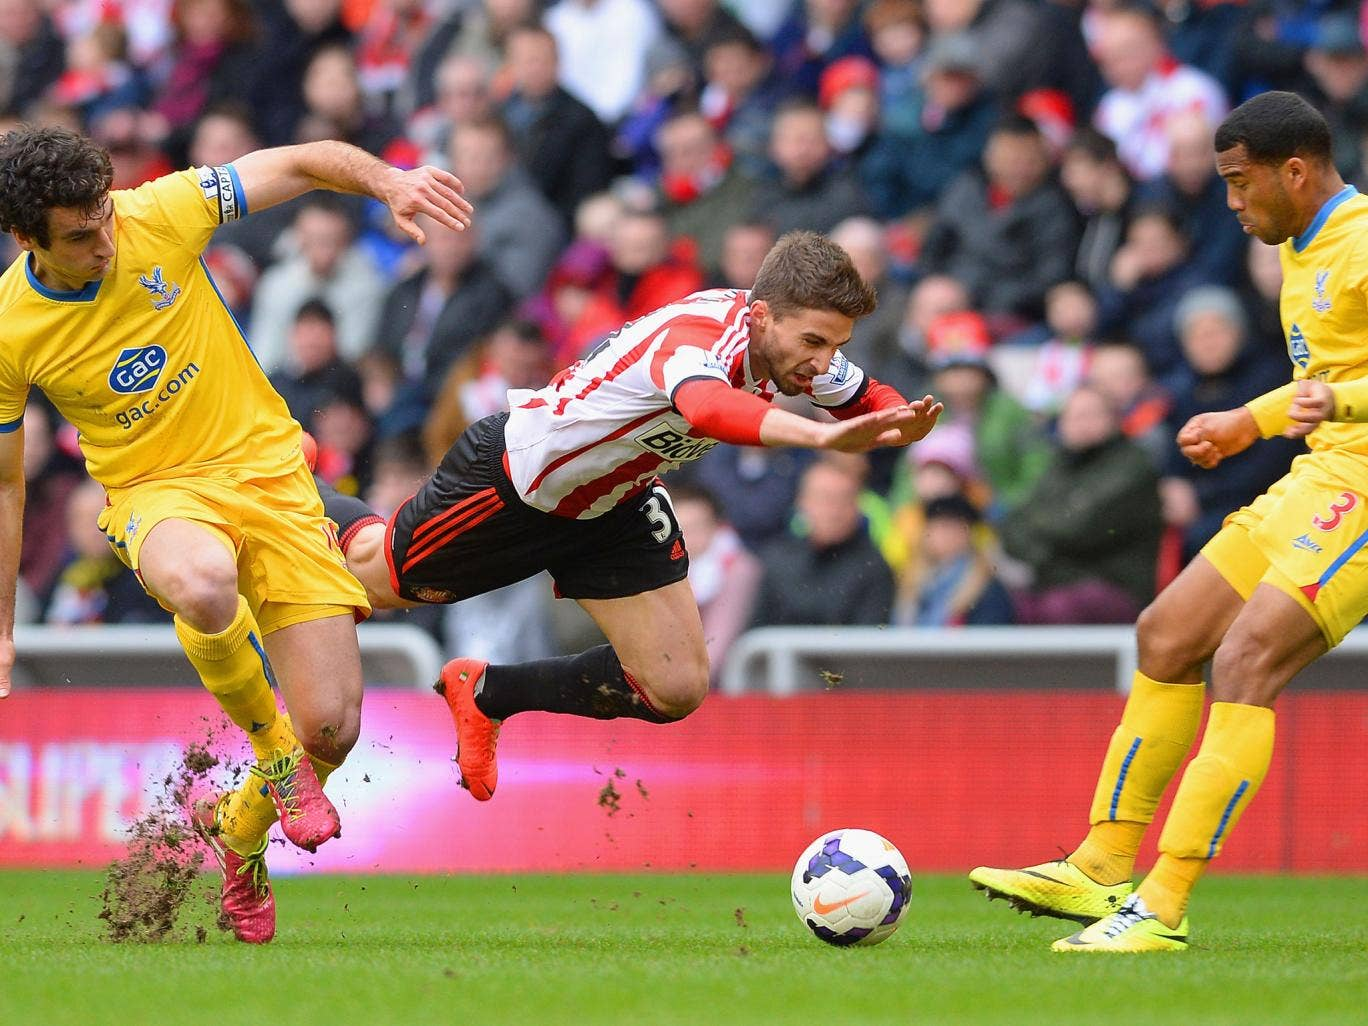 Fabio Borini of Sunderland clashes with Mile Jedinak and Adrian Mariappa of Crystal Palace